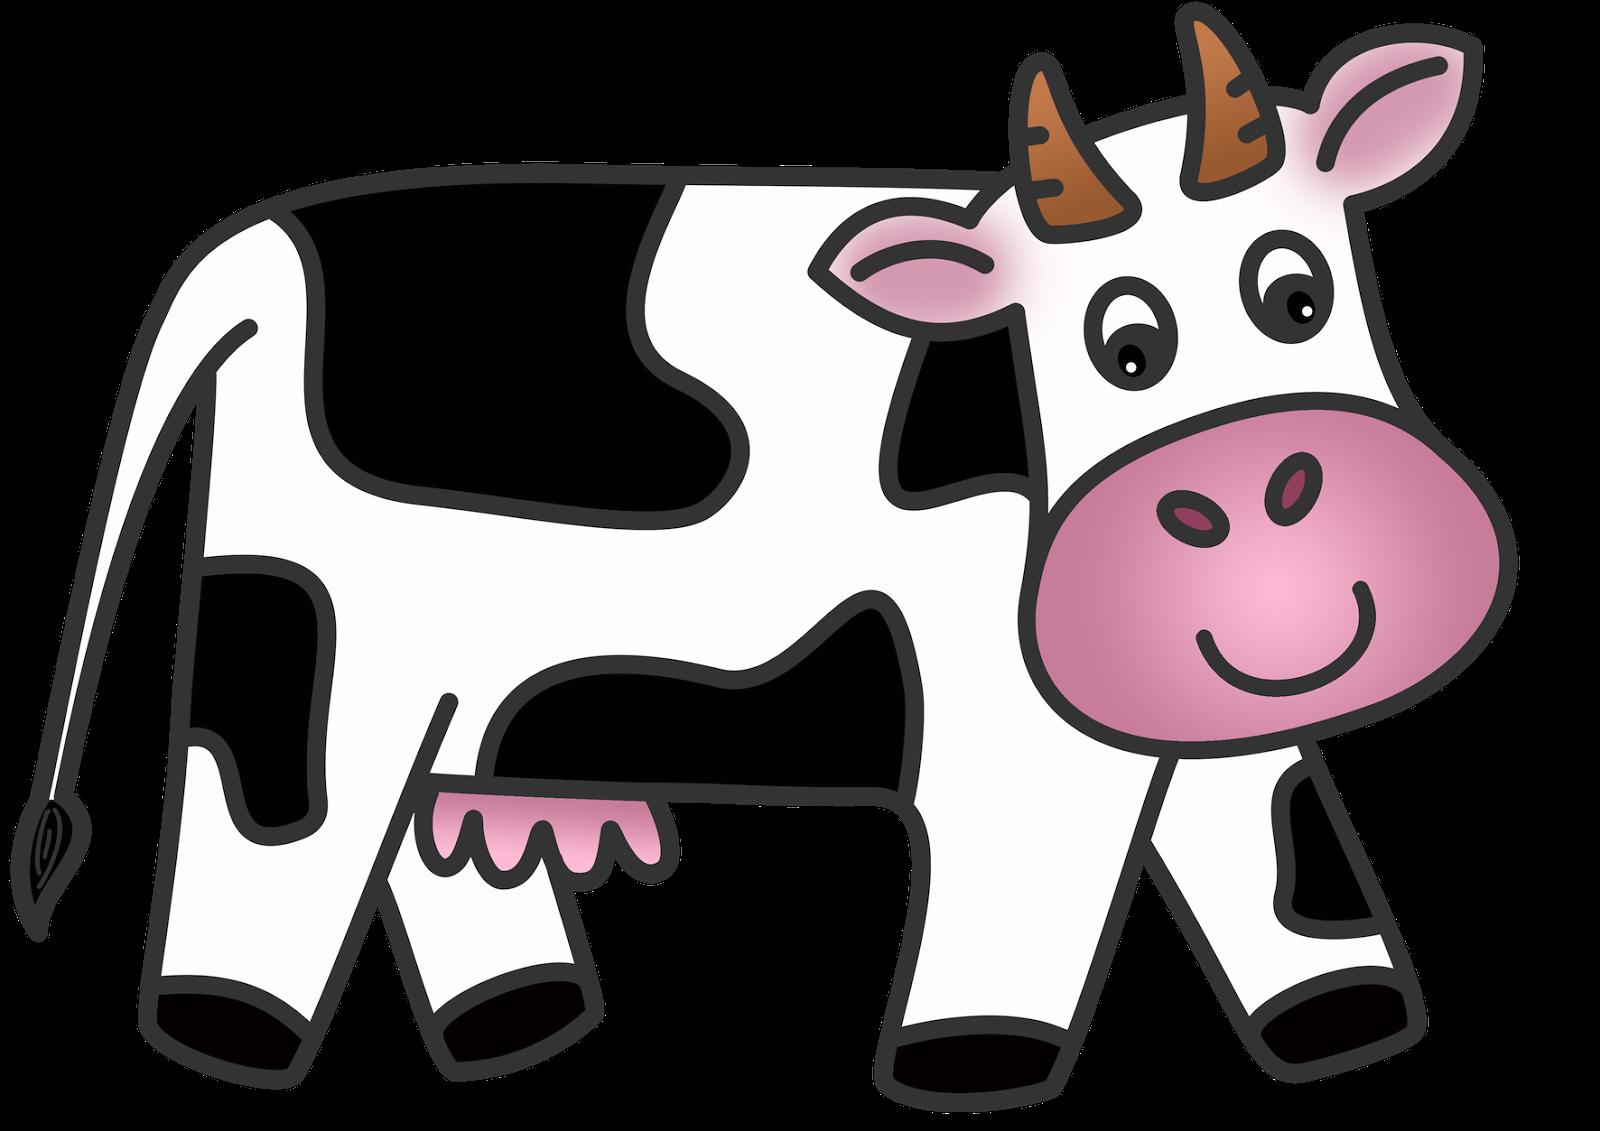 Cow Clip Art Animated Cow .-Cow Clip Art Animated Cow .-6